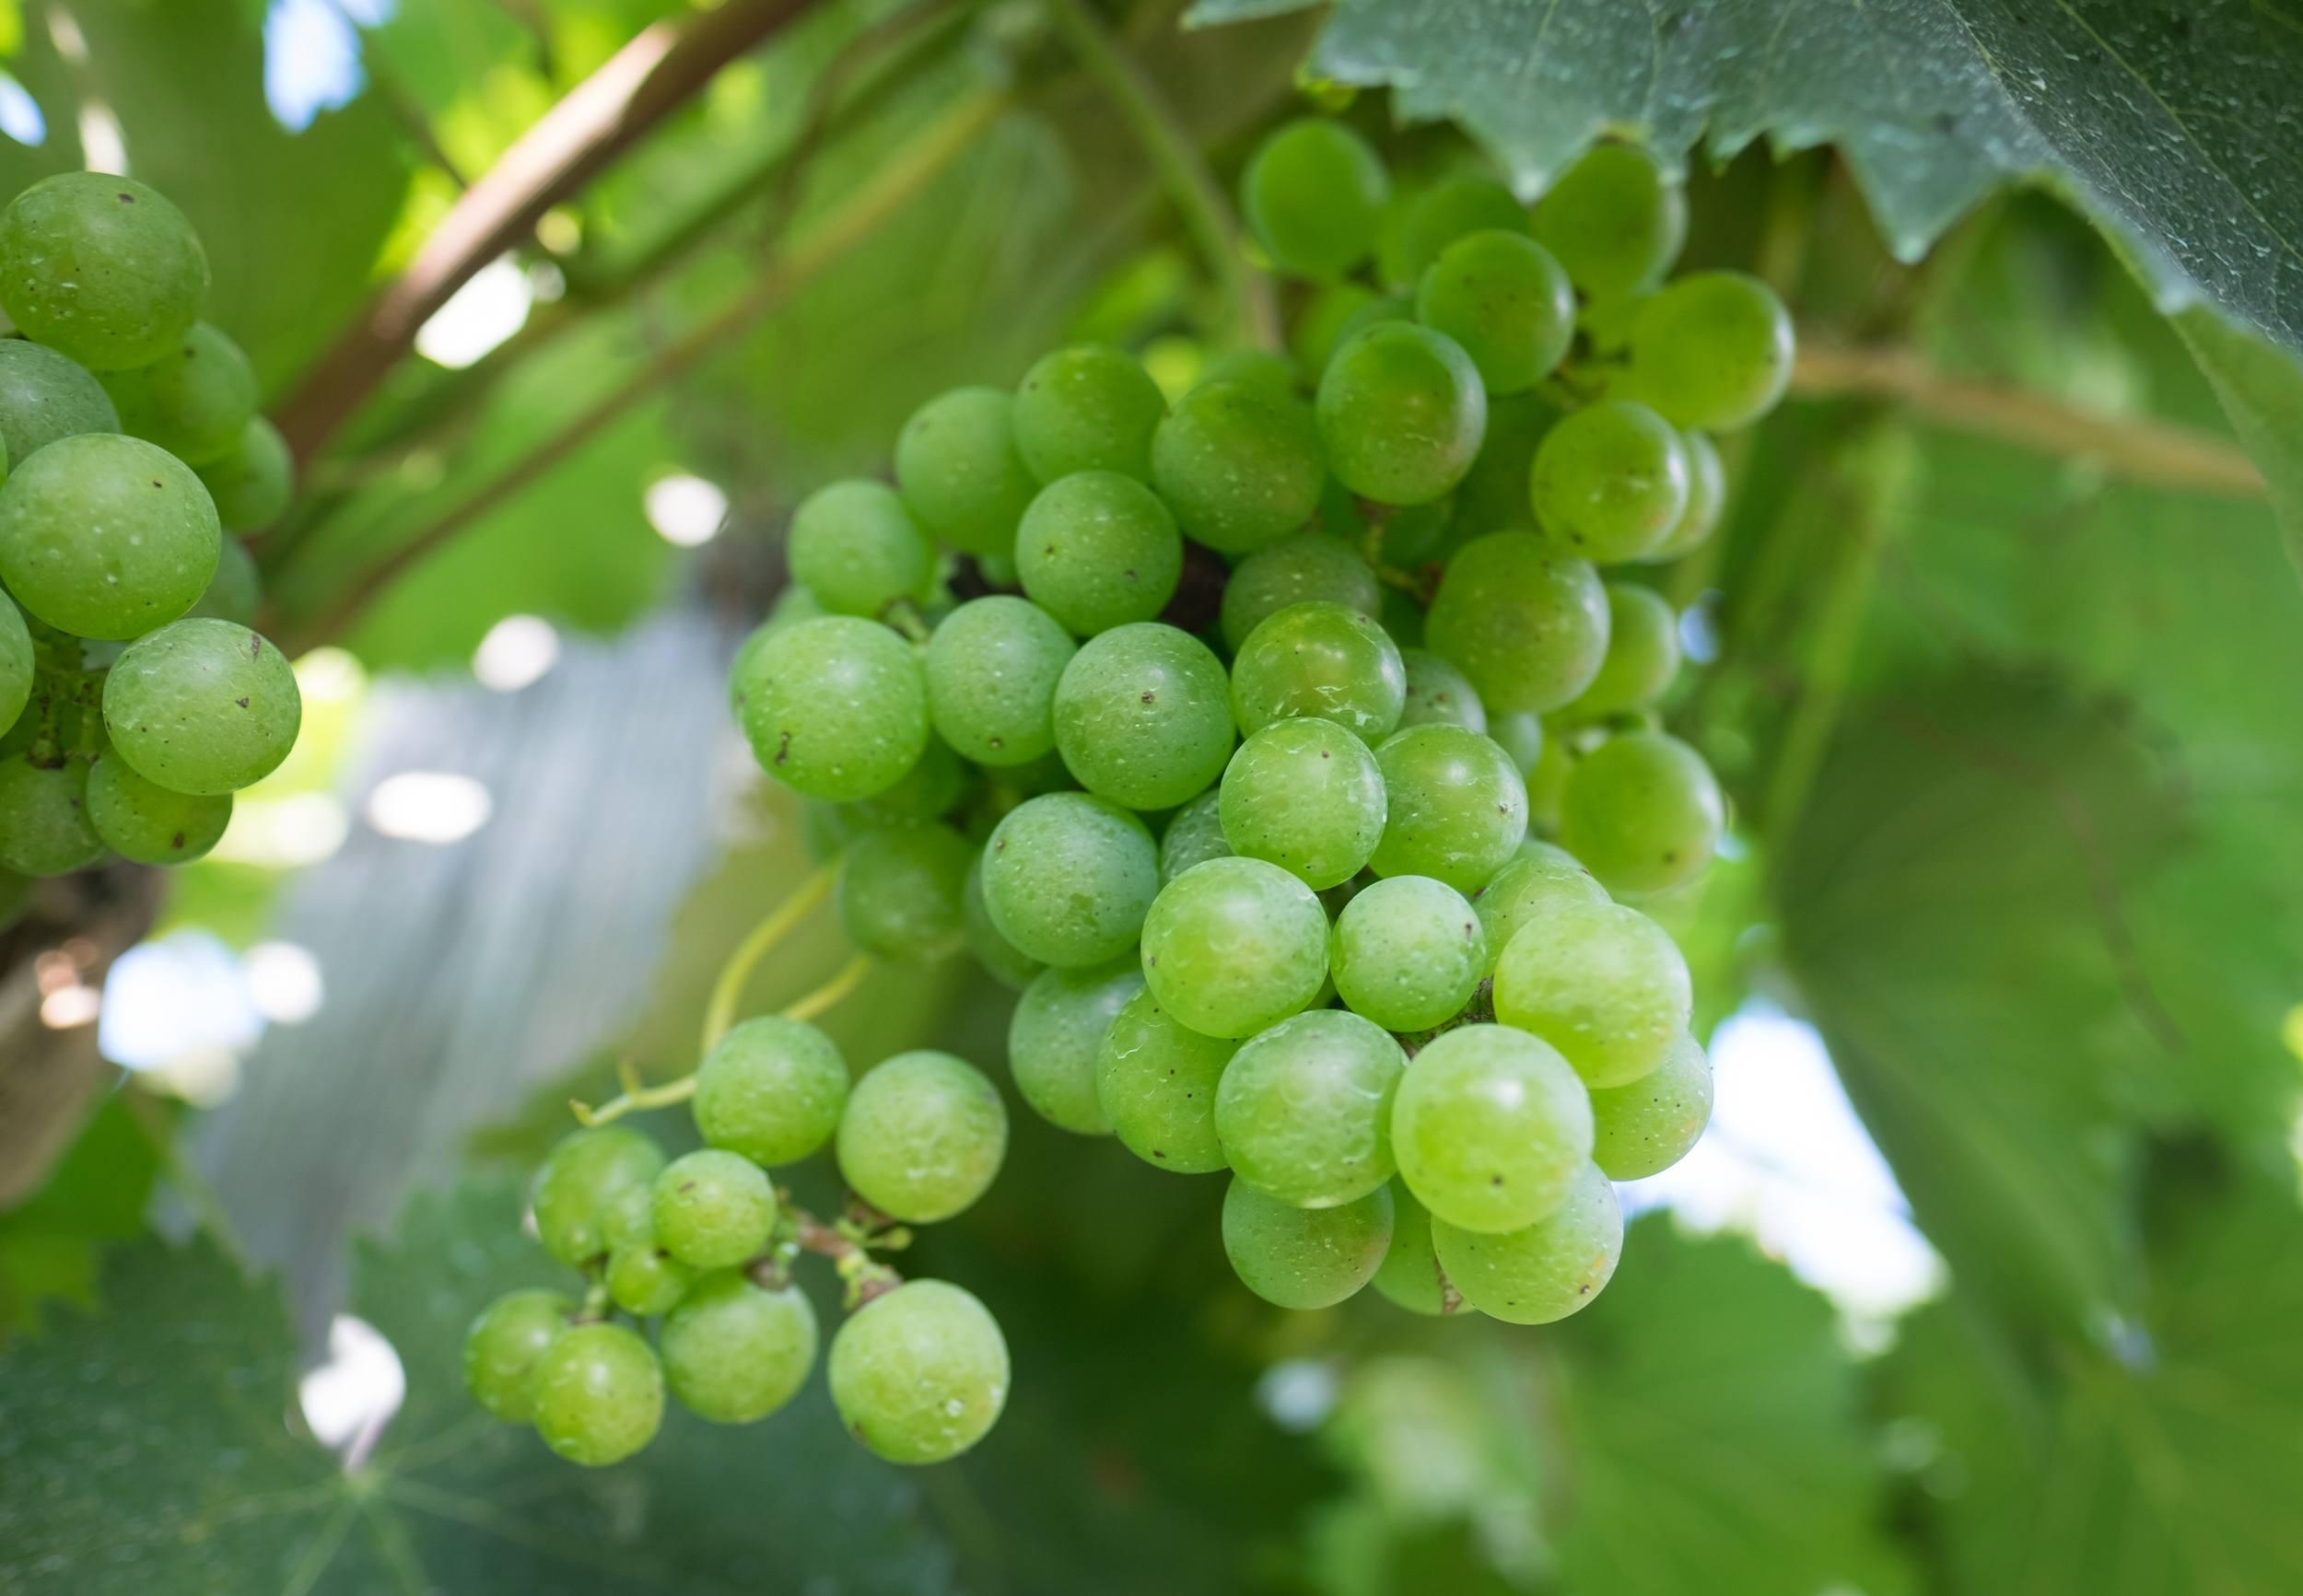 Green grapes nestled among green leaves on a vine.